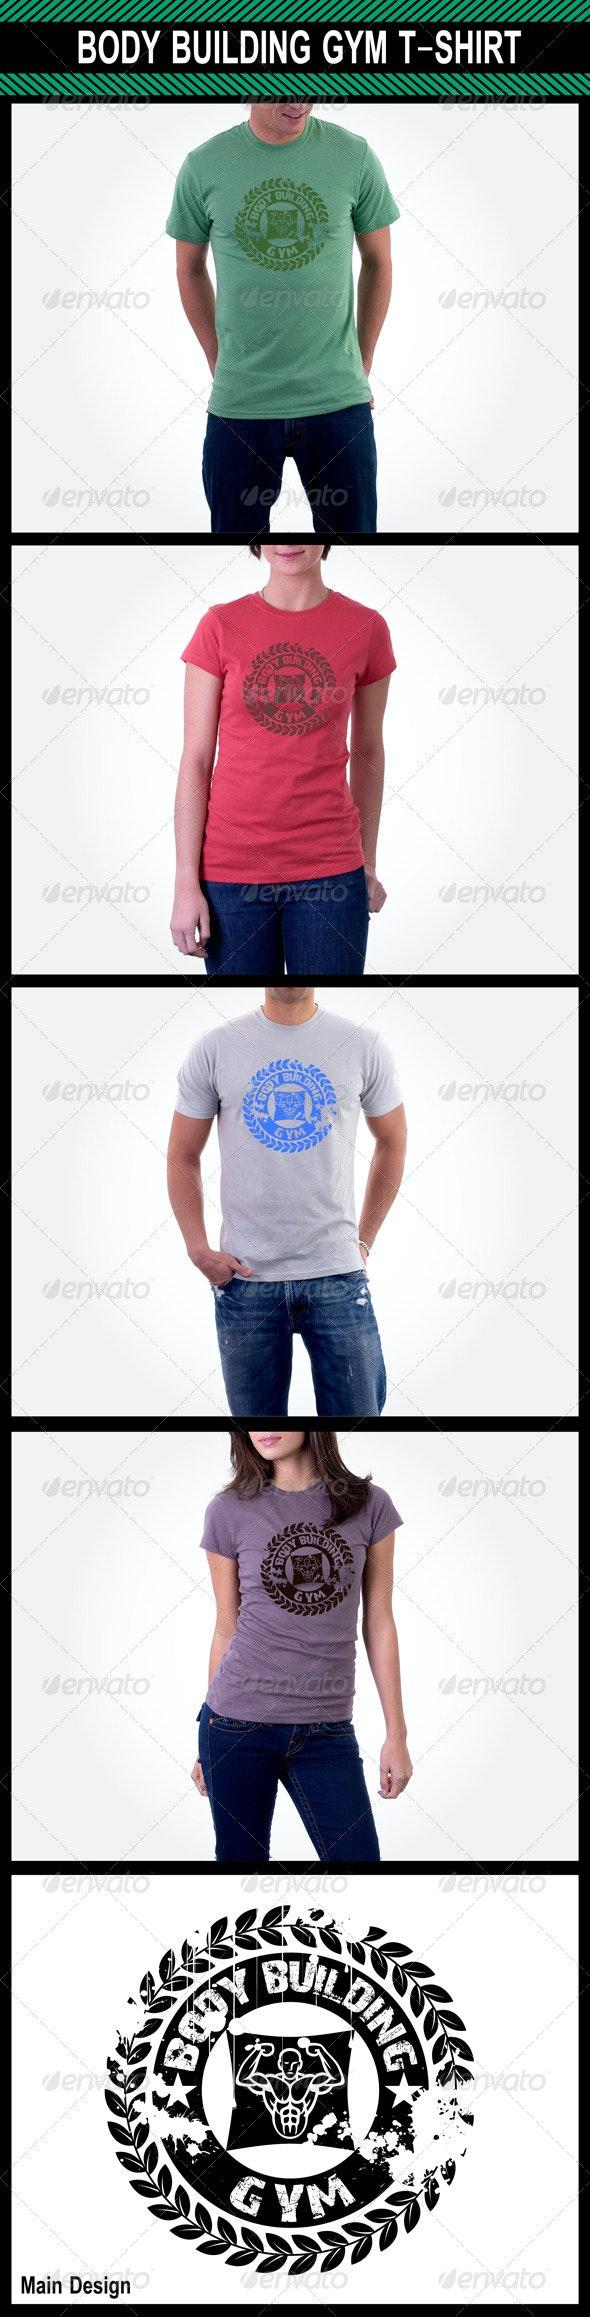 Body Building Gym T-Shirt - Sports & Teams T-Shirts